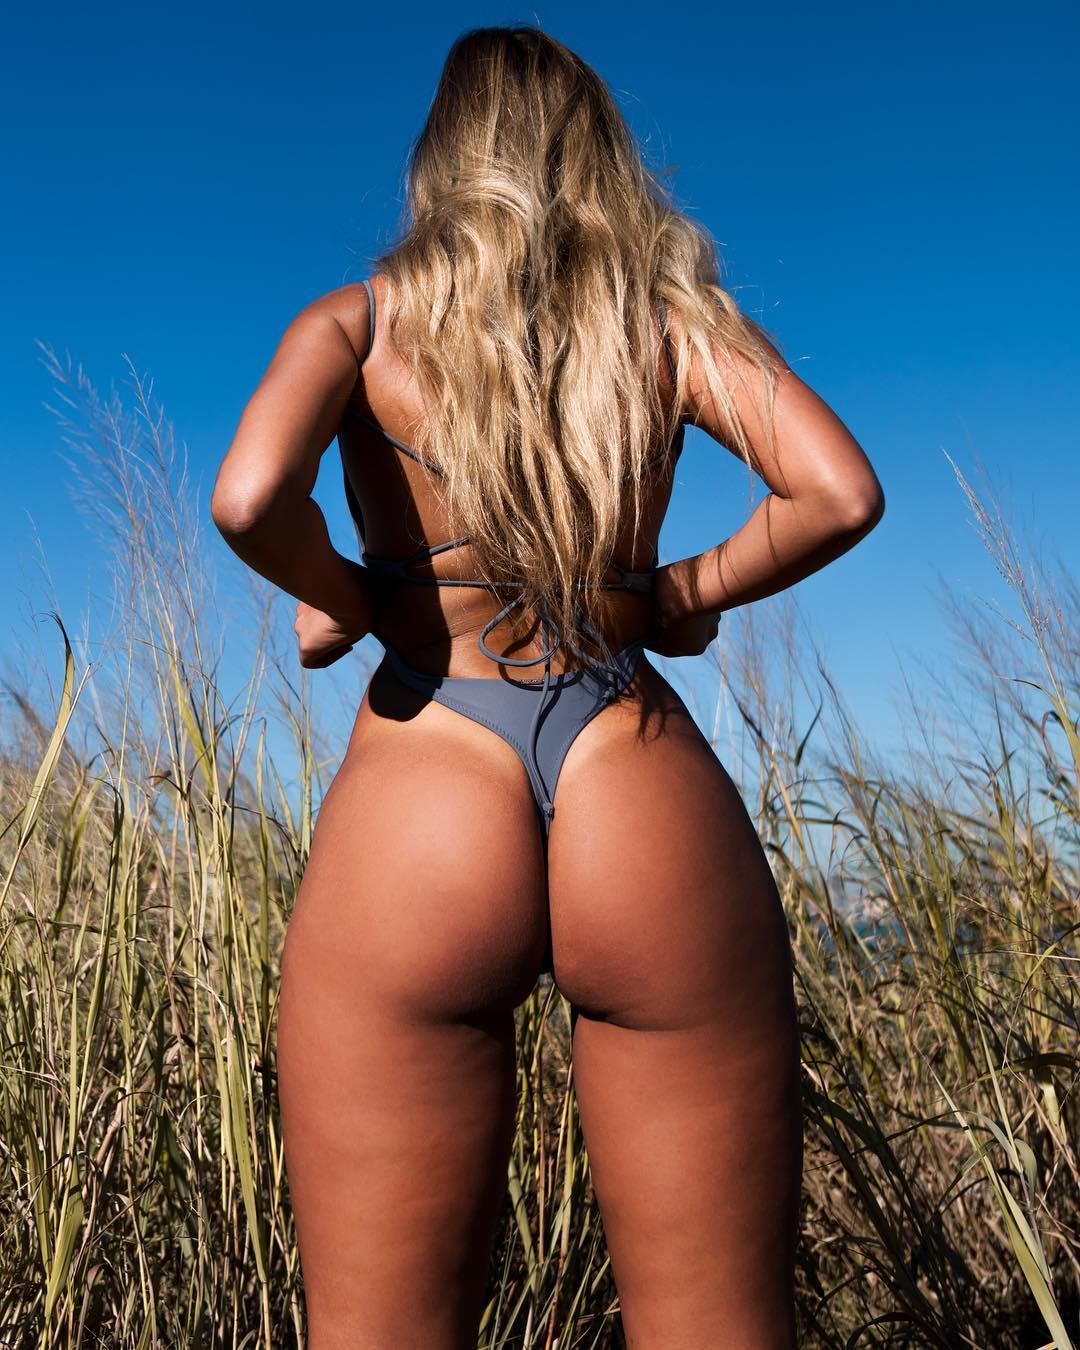 Natalia Garibotto Nude Onlyfans Leaked 0017